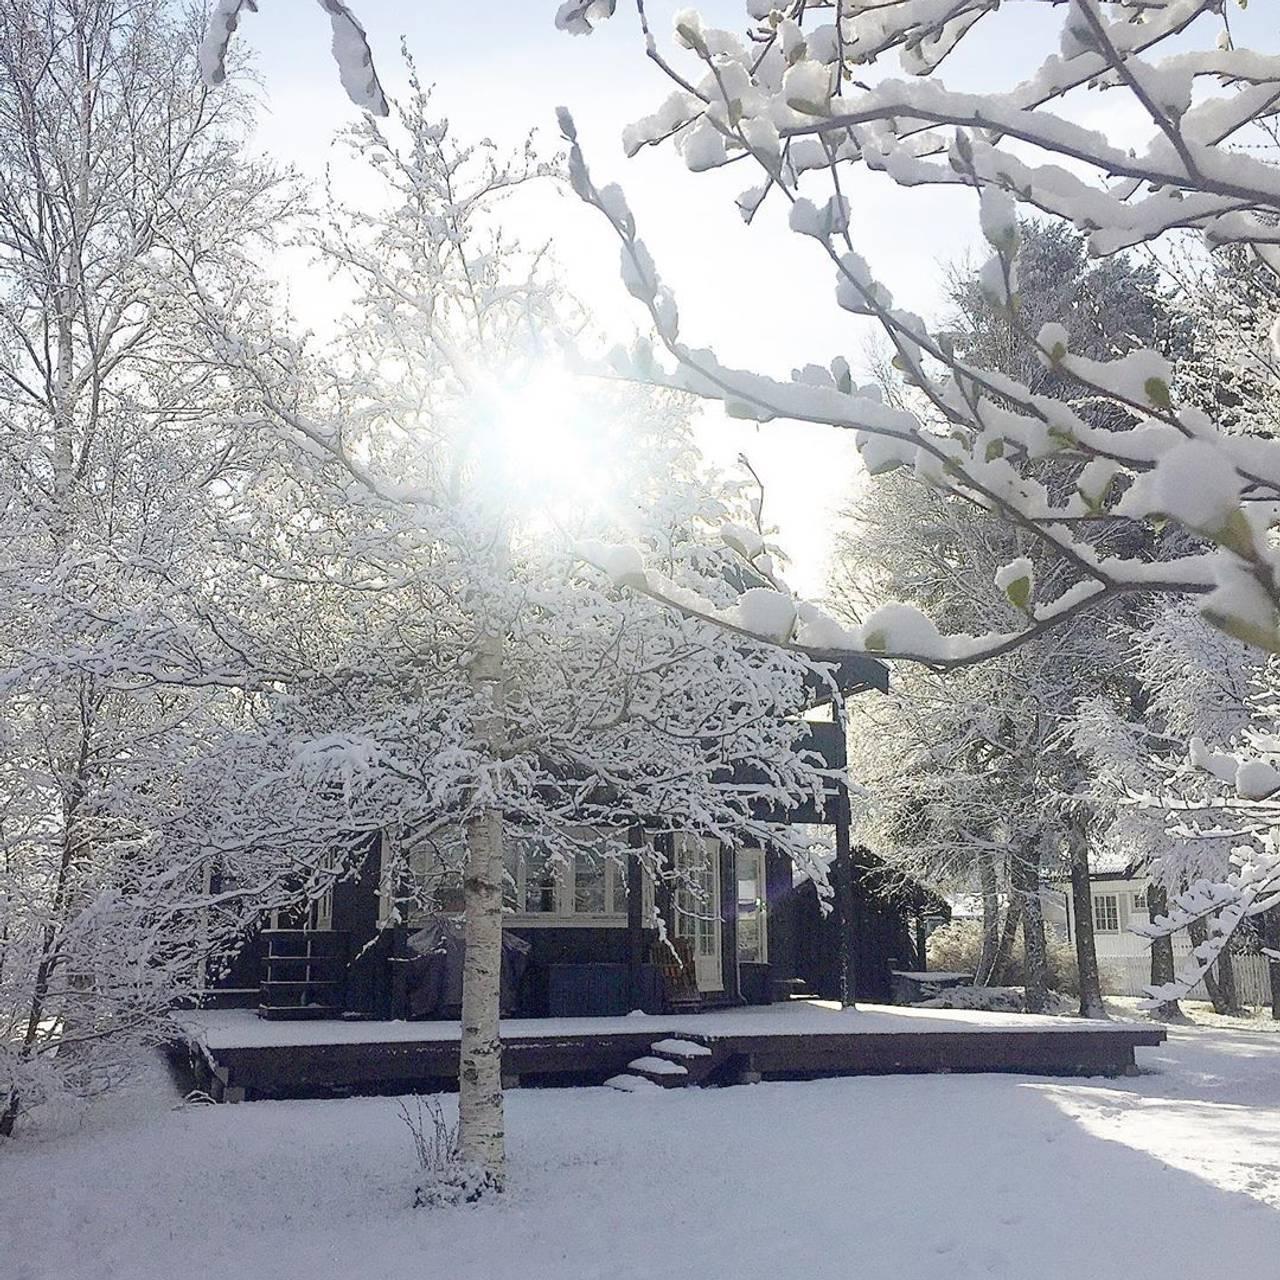 Et hus med trær foran, dekket i snø.